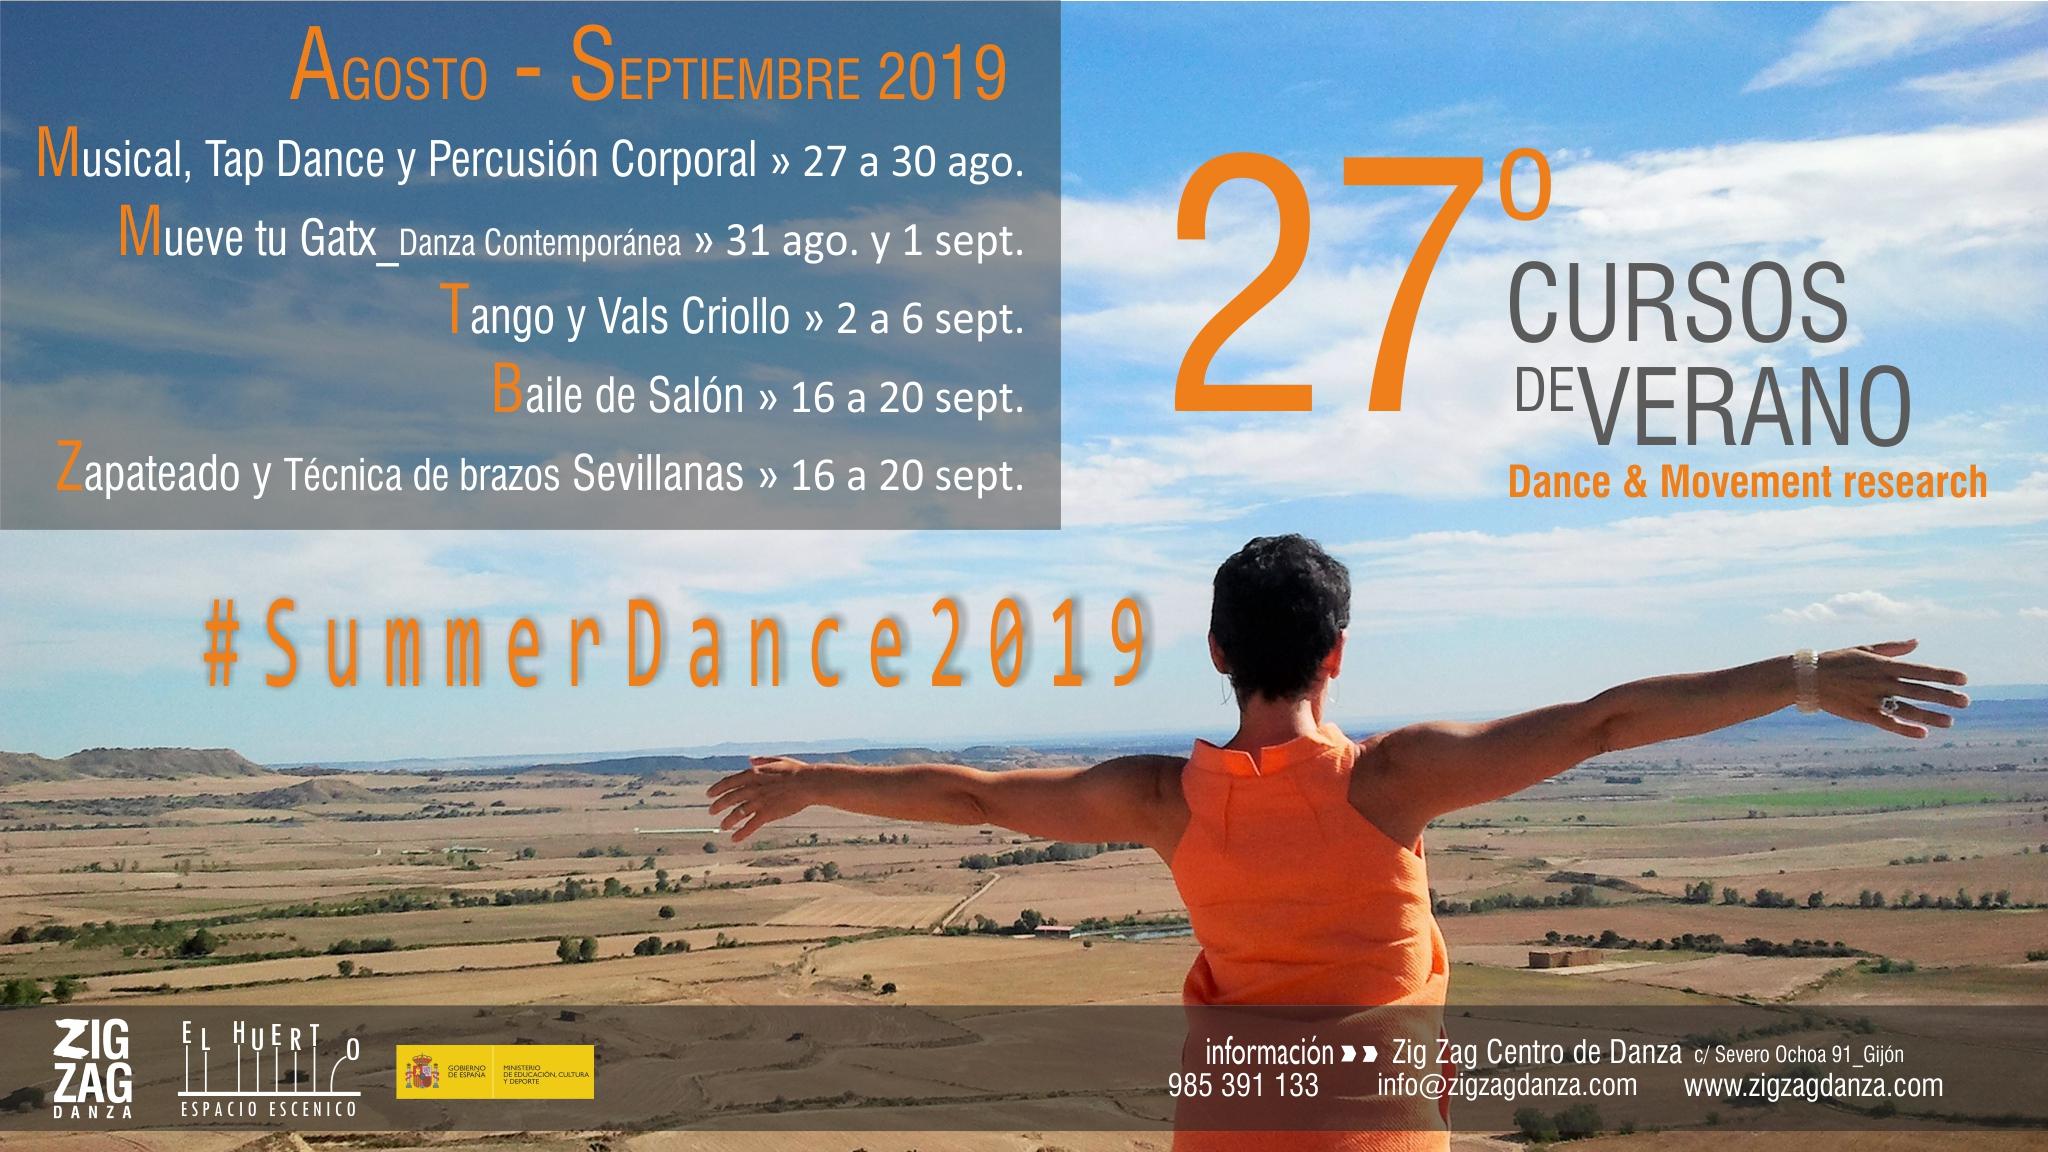 Programa cursos de Verano 2018. Summerdance 2018. Zig Zag Danza.